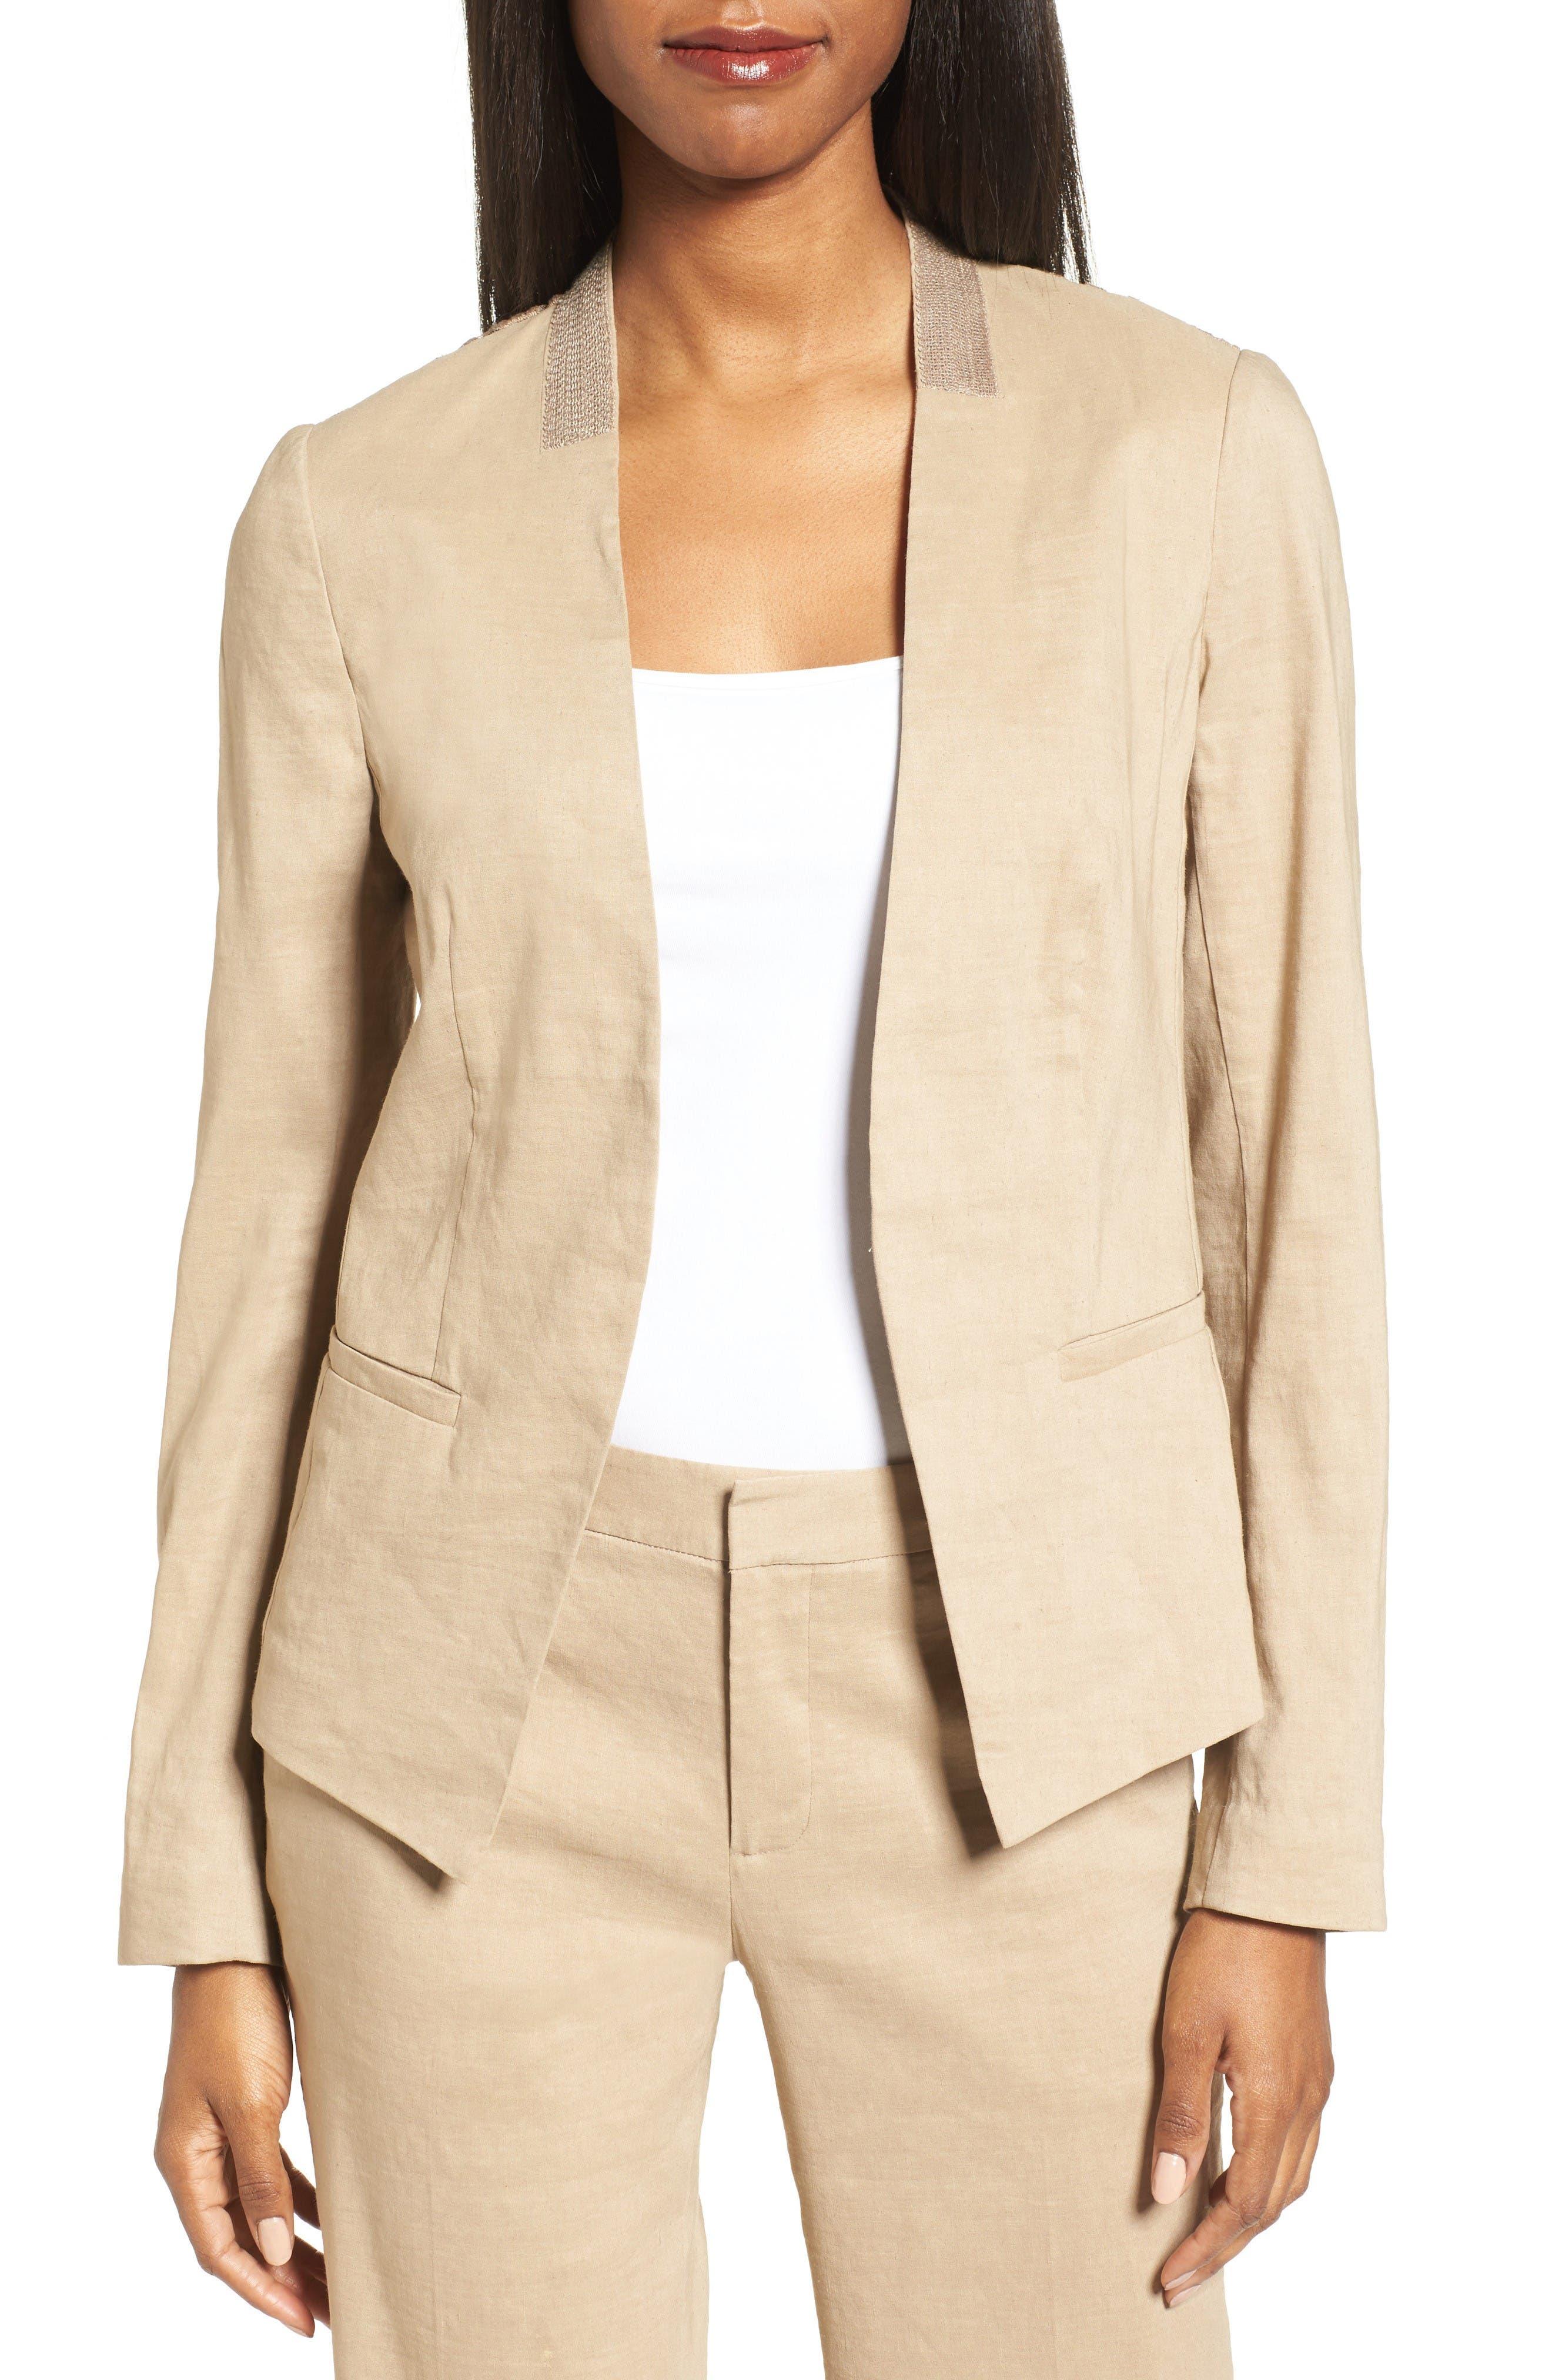 Alternate Image 1 Selected - Kobi Halperin Claudia Lace Trim Jacket